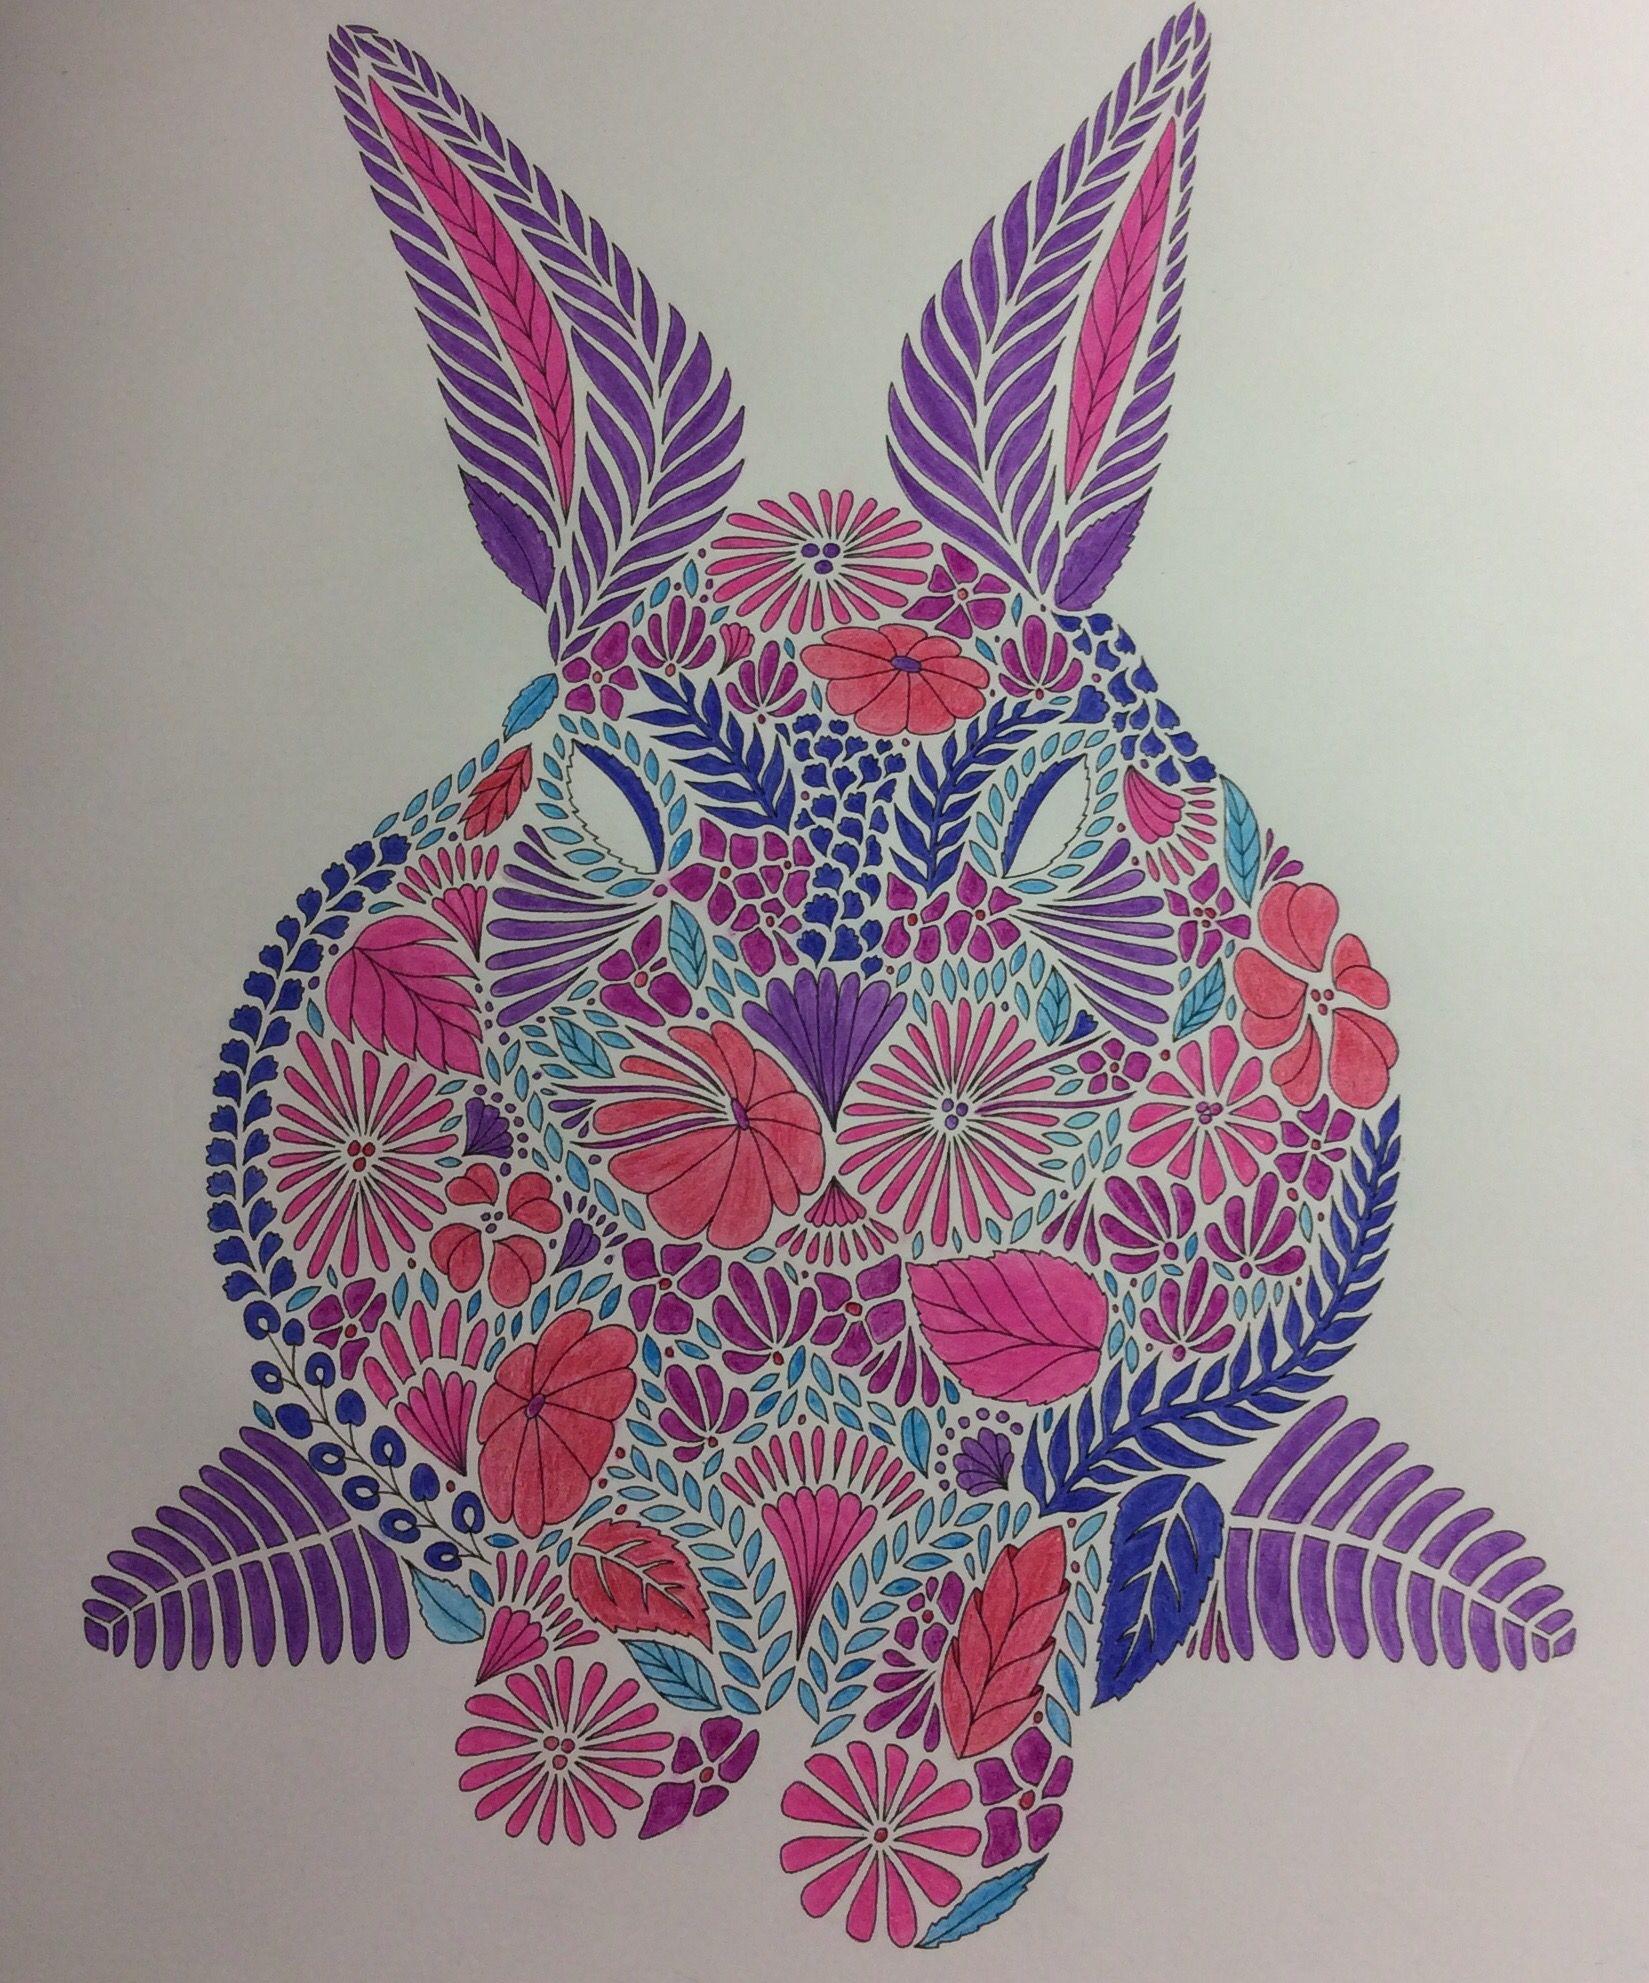 coloring book rabbit pictures : Animal Kingdom Book Rabbit